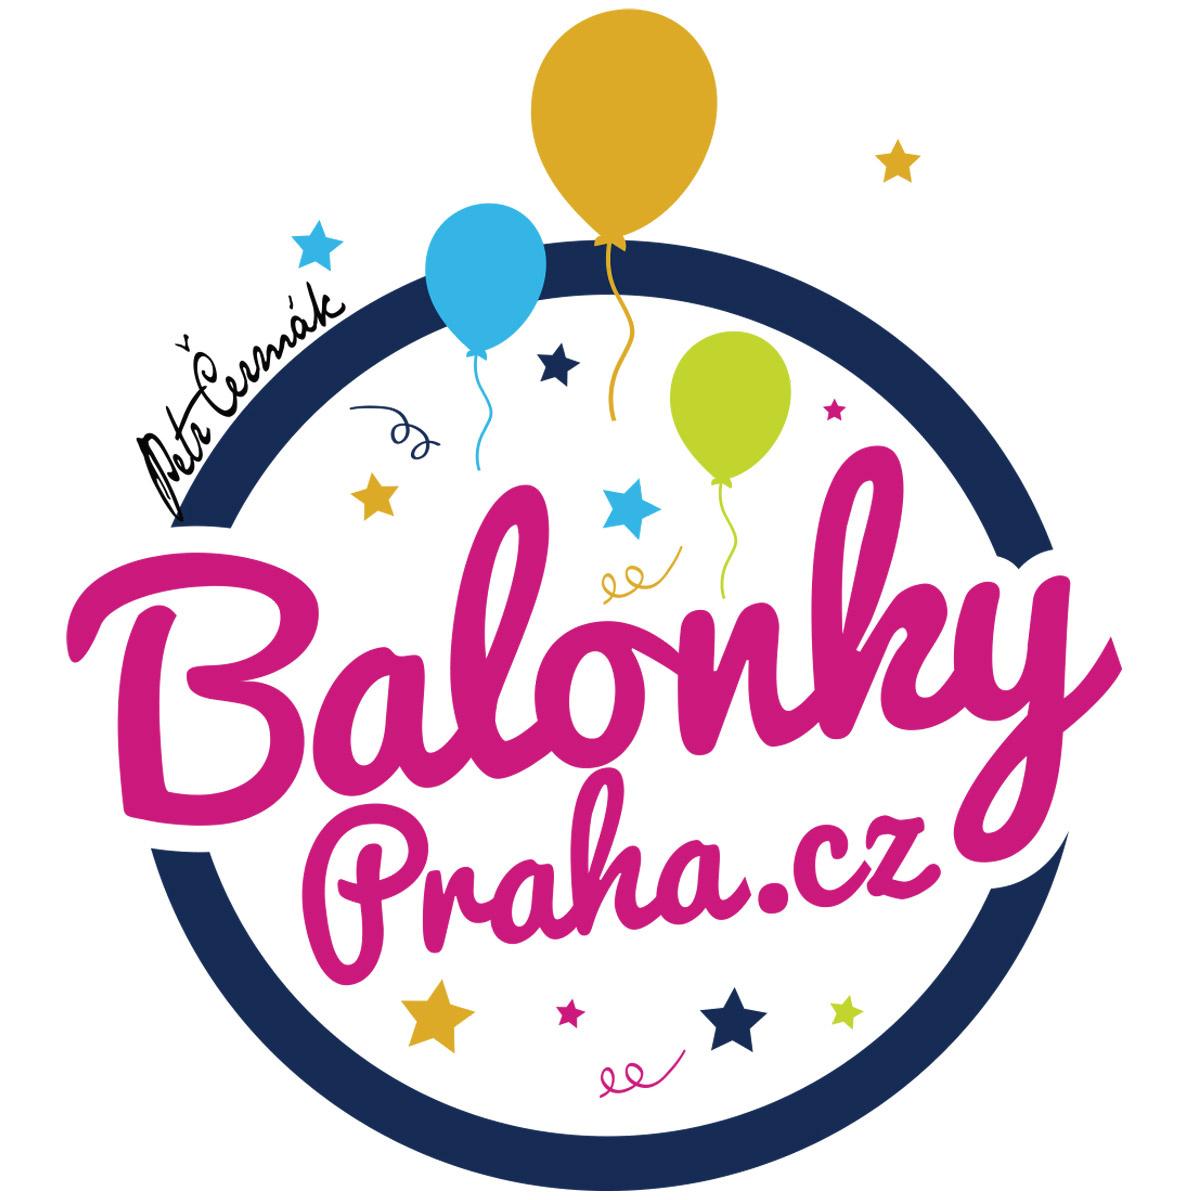 balonkypraha